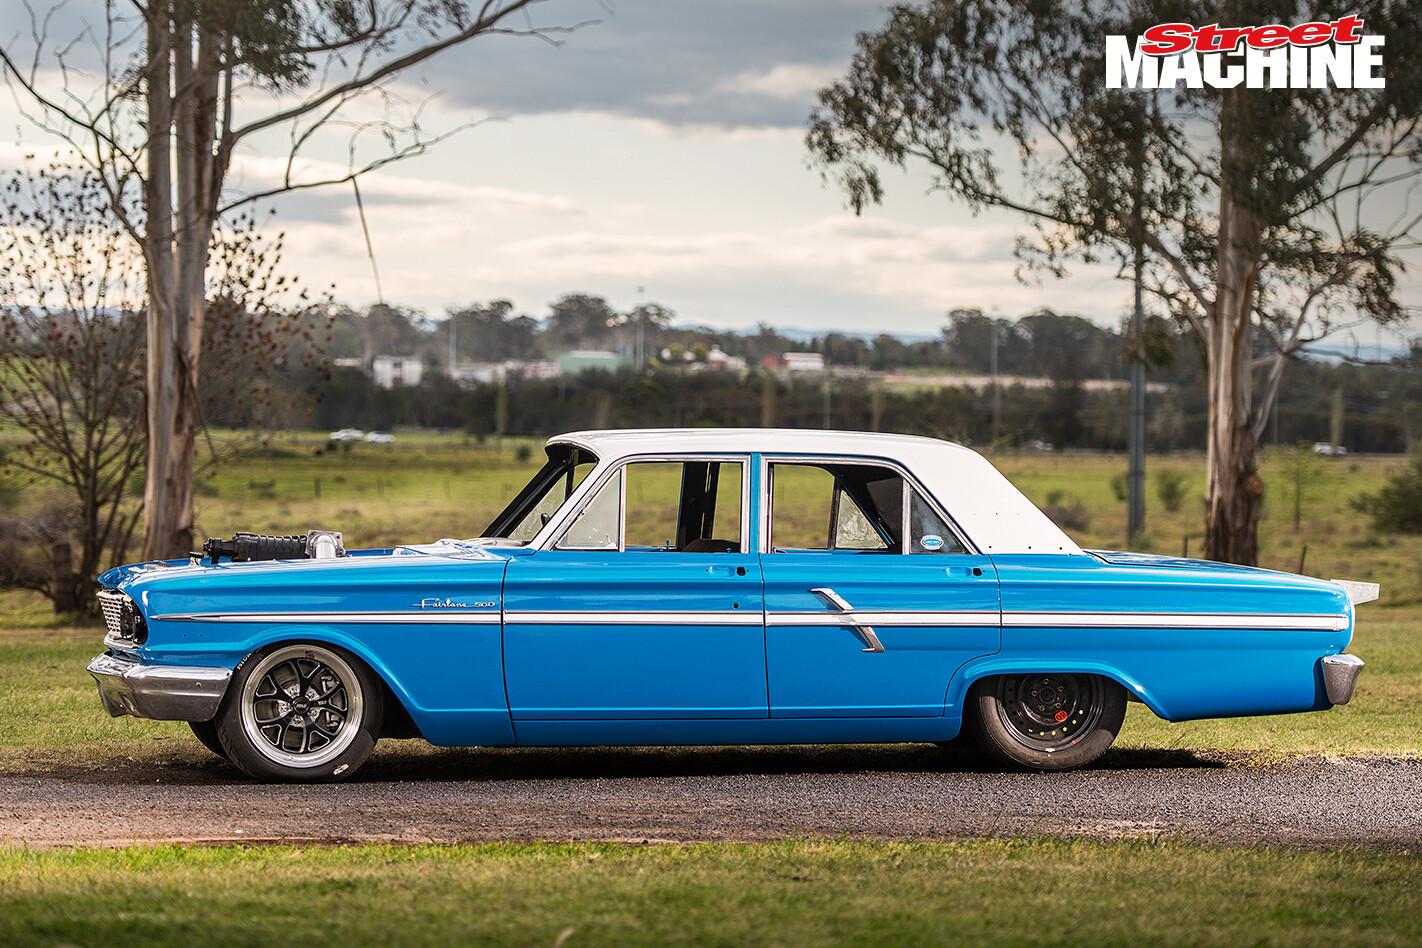 Ford Compact Fairlane V8 6